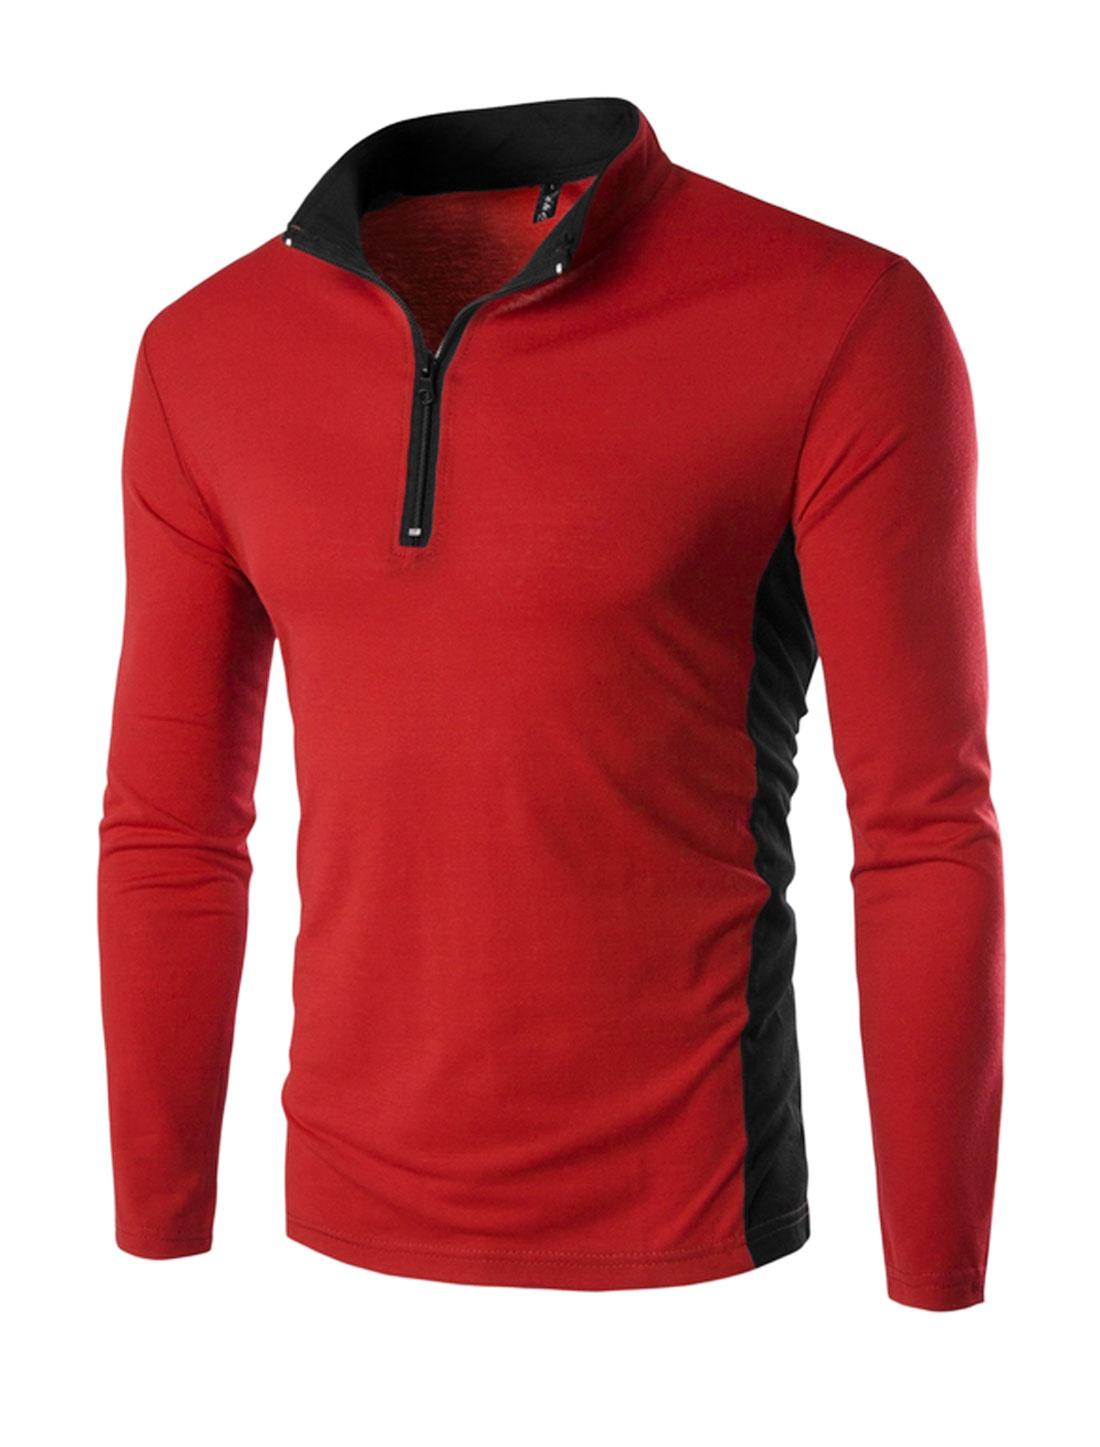 Men Stand Collar Zipper Upper Contrast Color Slim Fit T-Shirt Red M